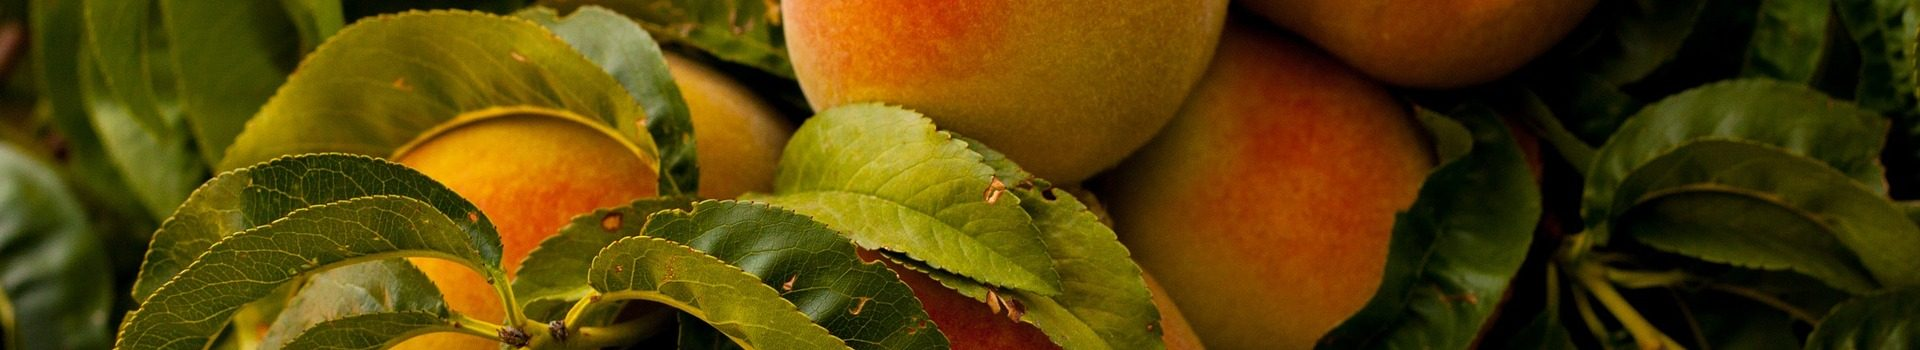 peaches-869386_1920